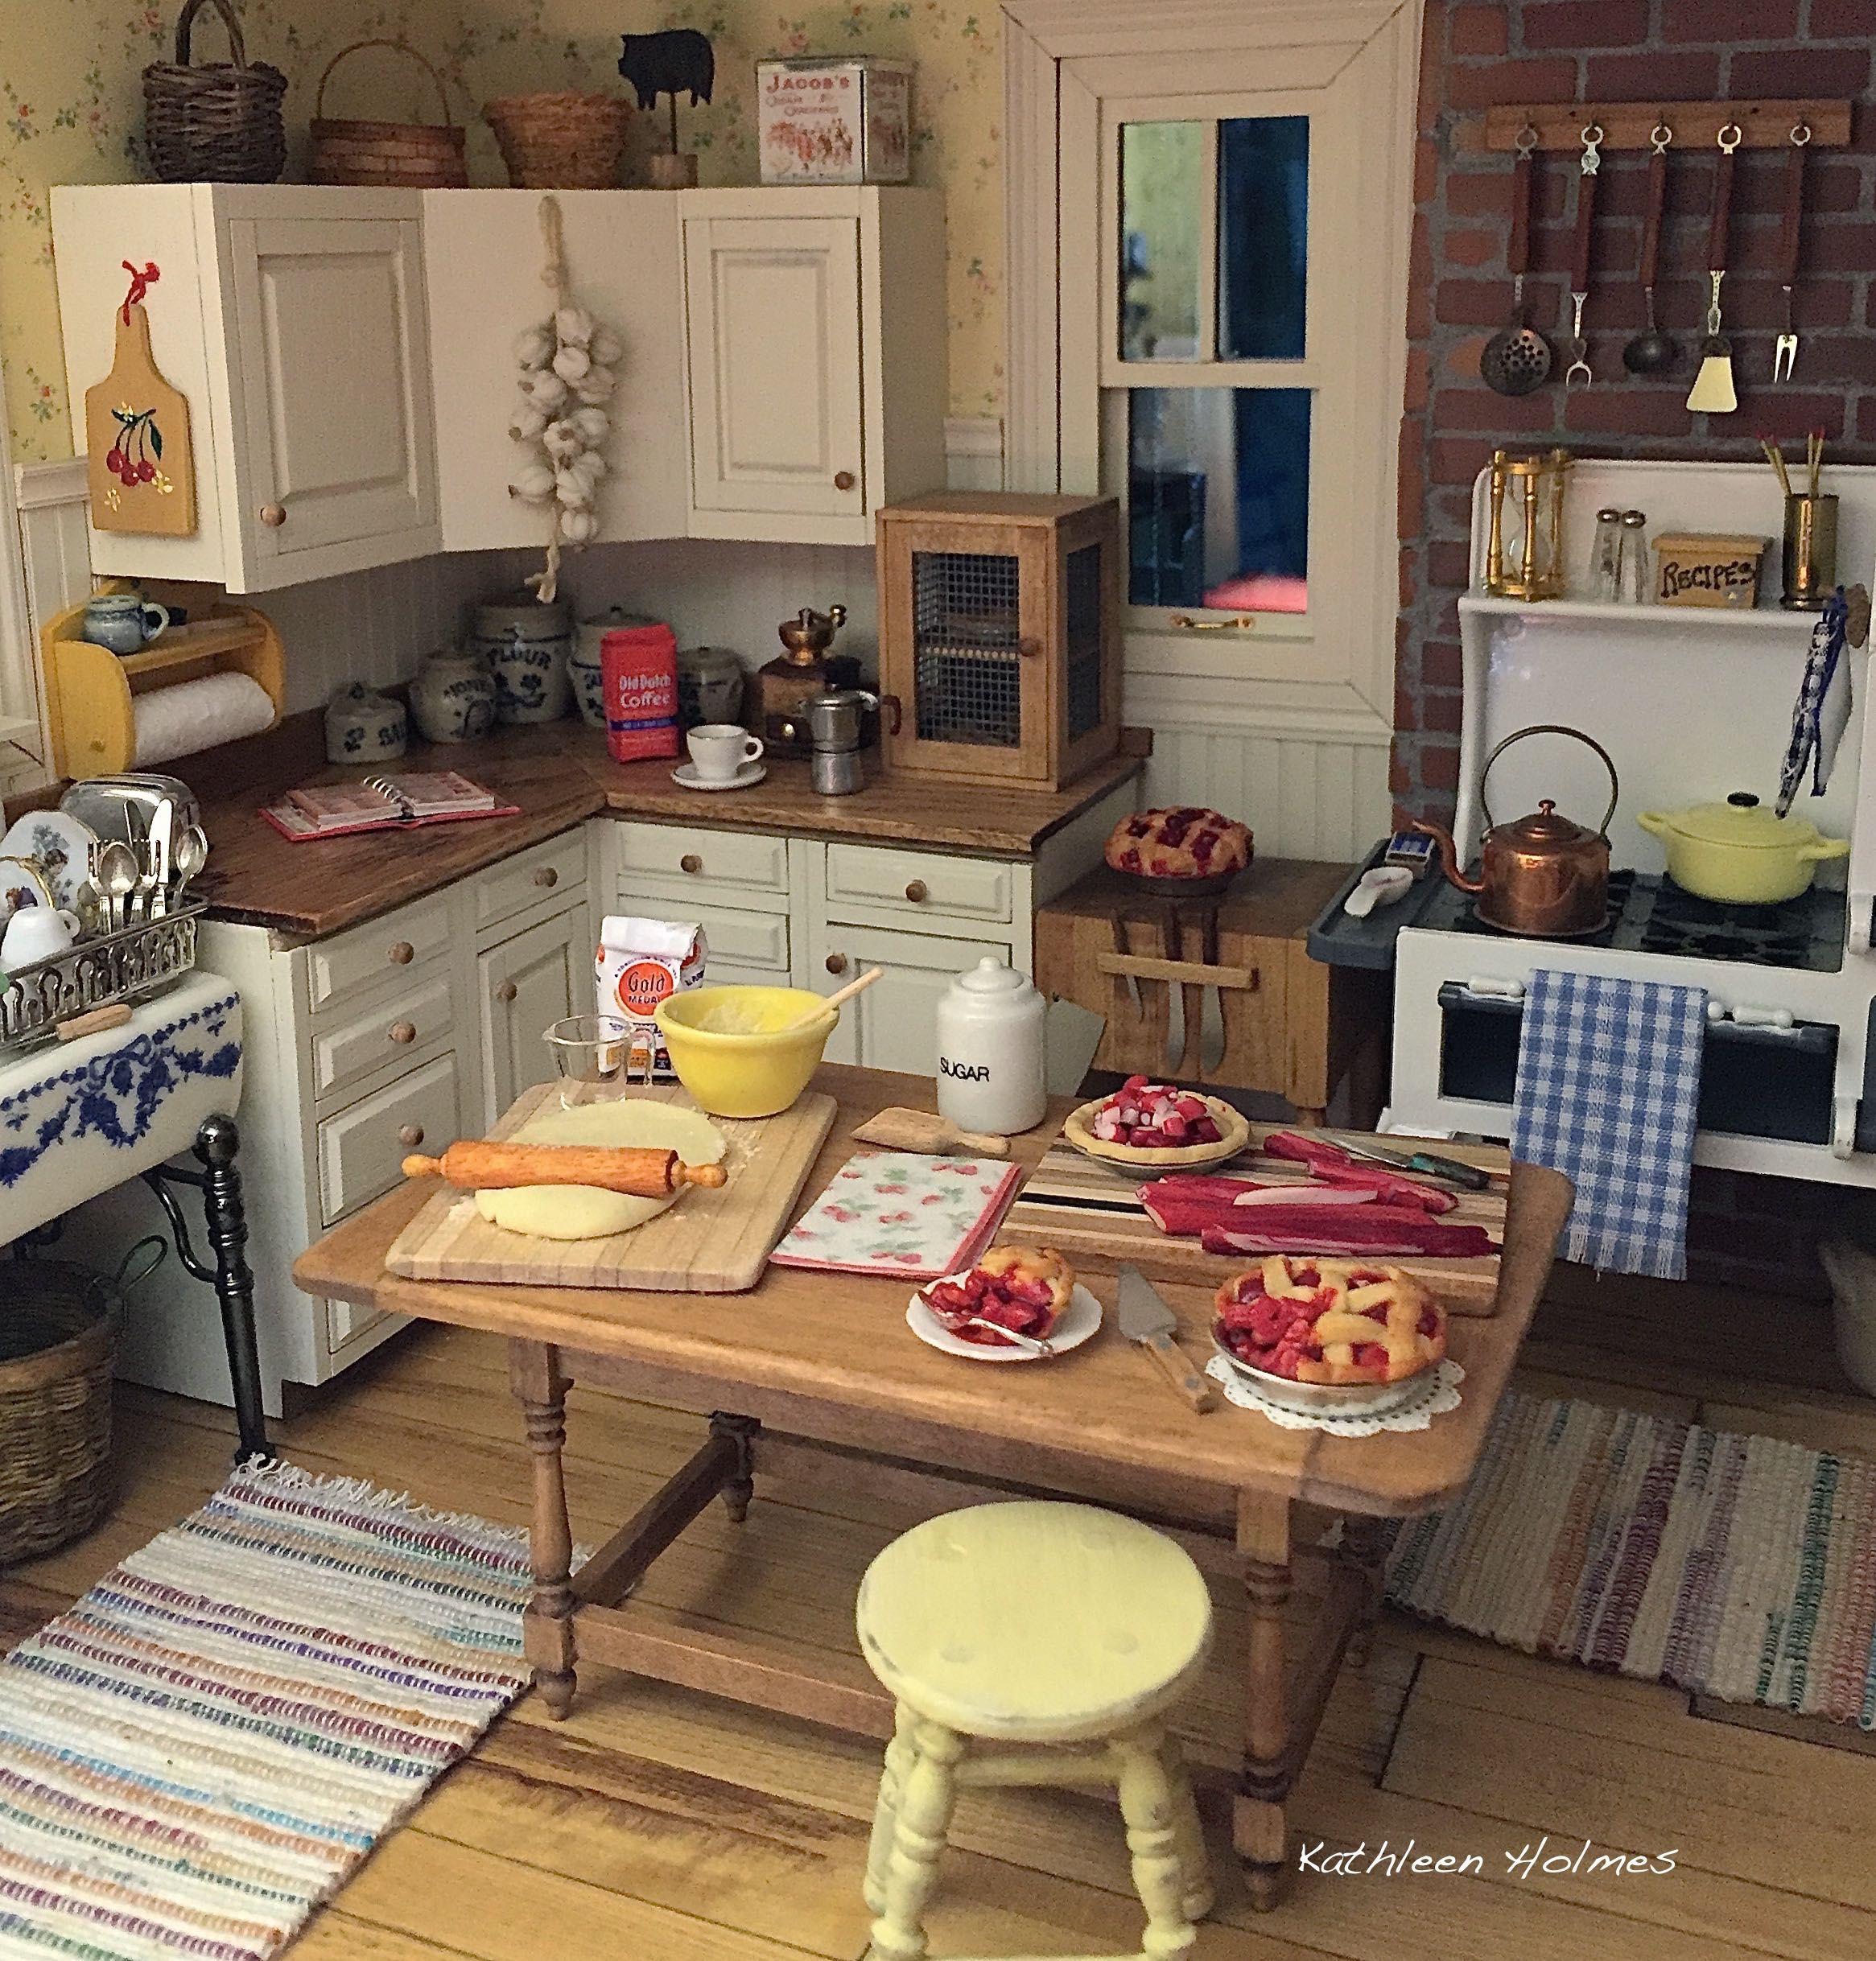 225 Best The Miniature Kitchen Images On Pinterest: Making Rhubarb Pie In Kathleen Holmes Dollhouse Kitchen